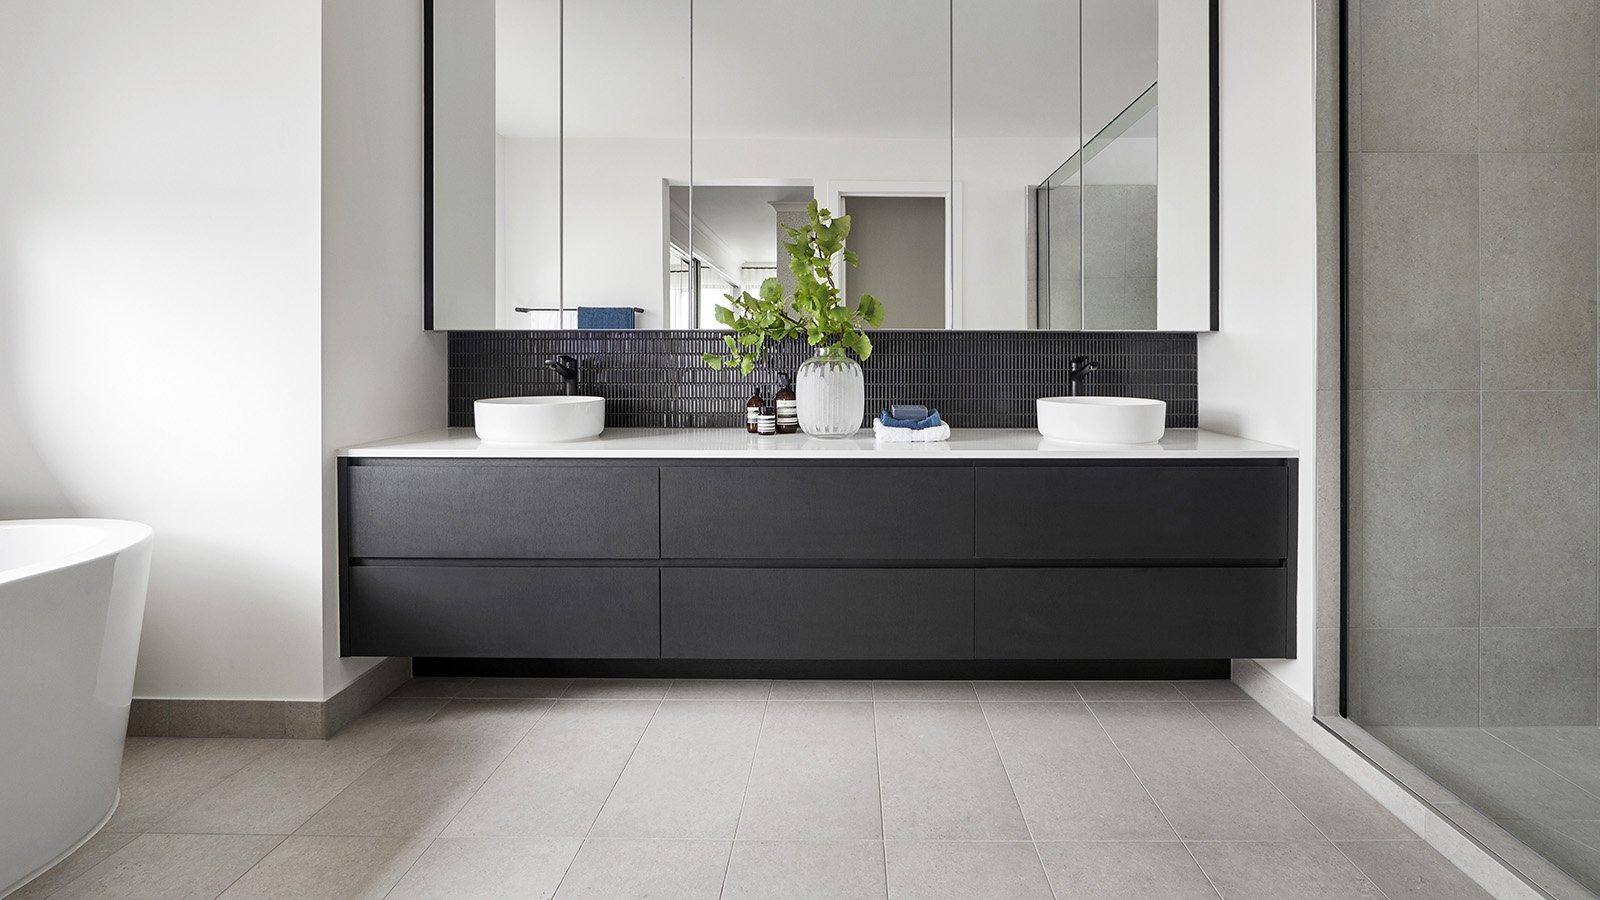 Tile floor in bathroom